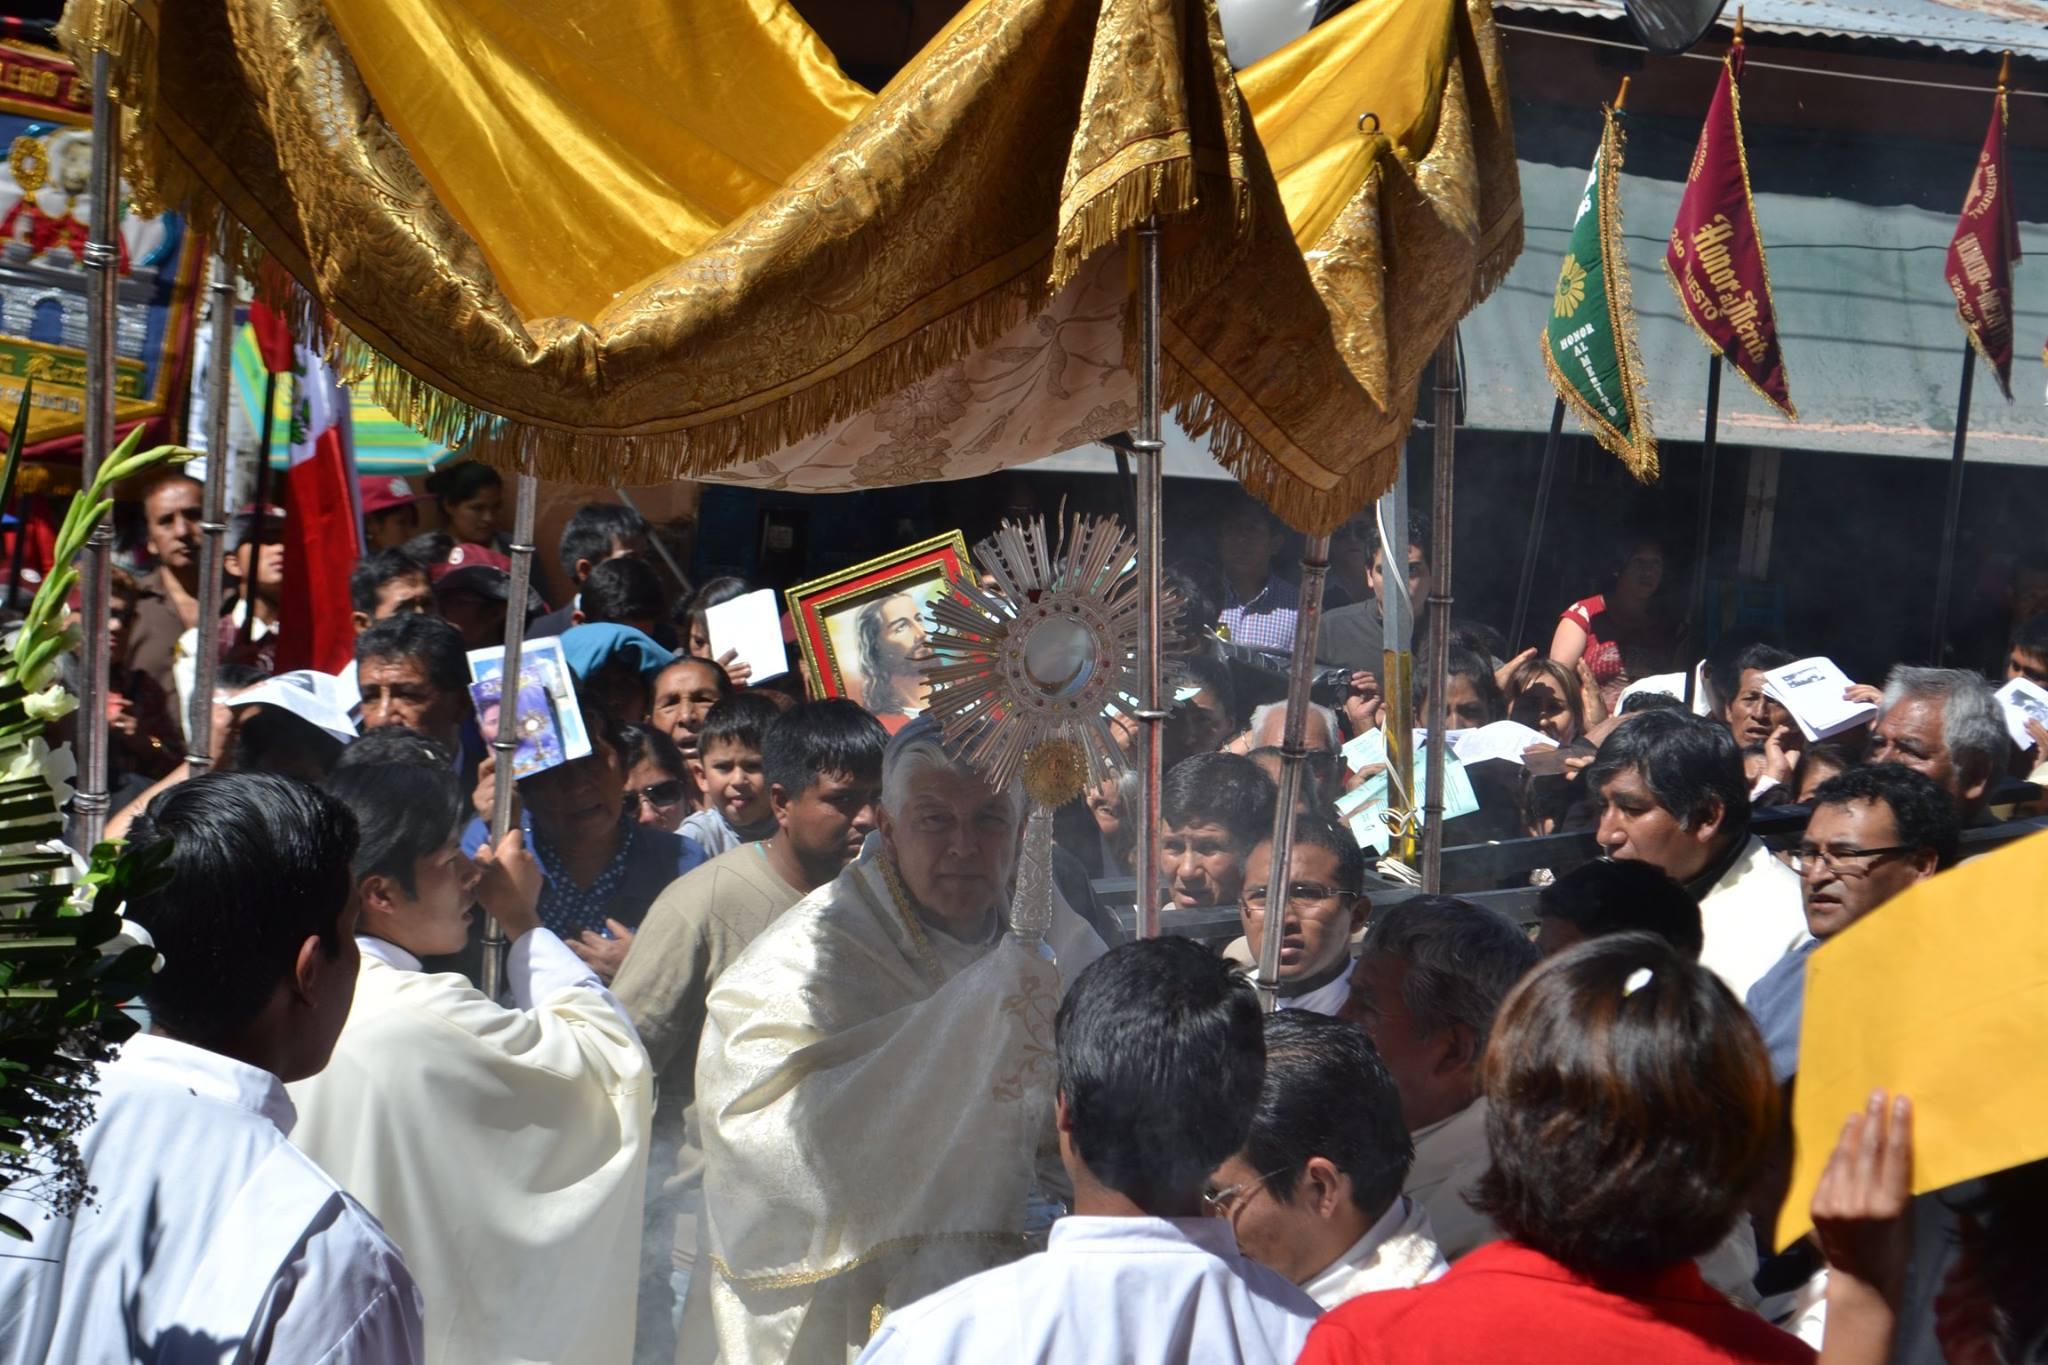 Matrimonio Catolico Homilia : ¡ayacuchanos salieron en procesión por corpus christi